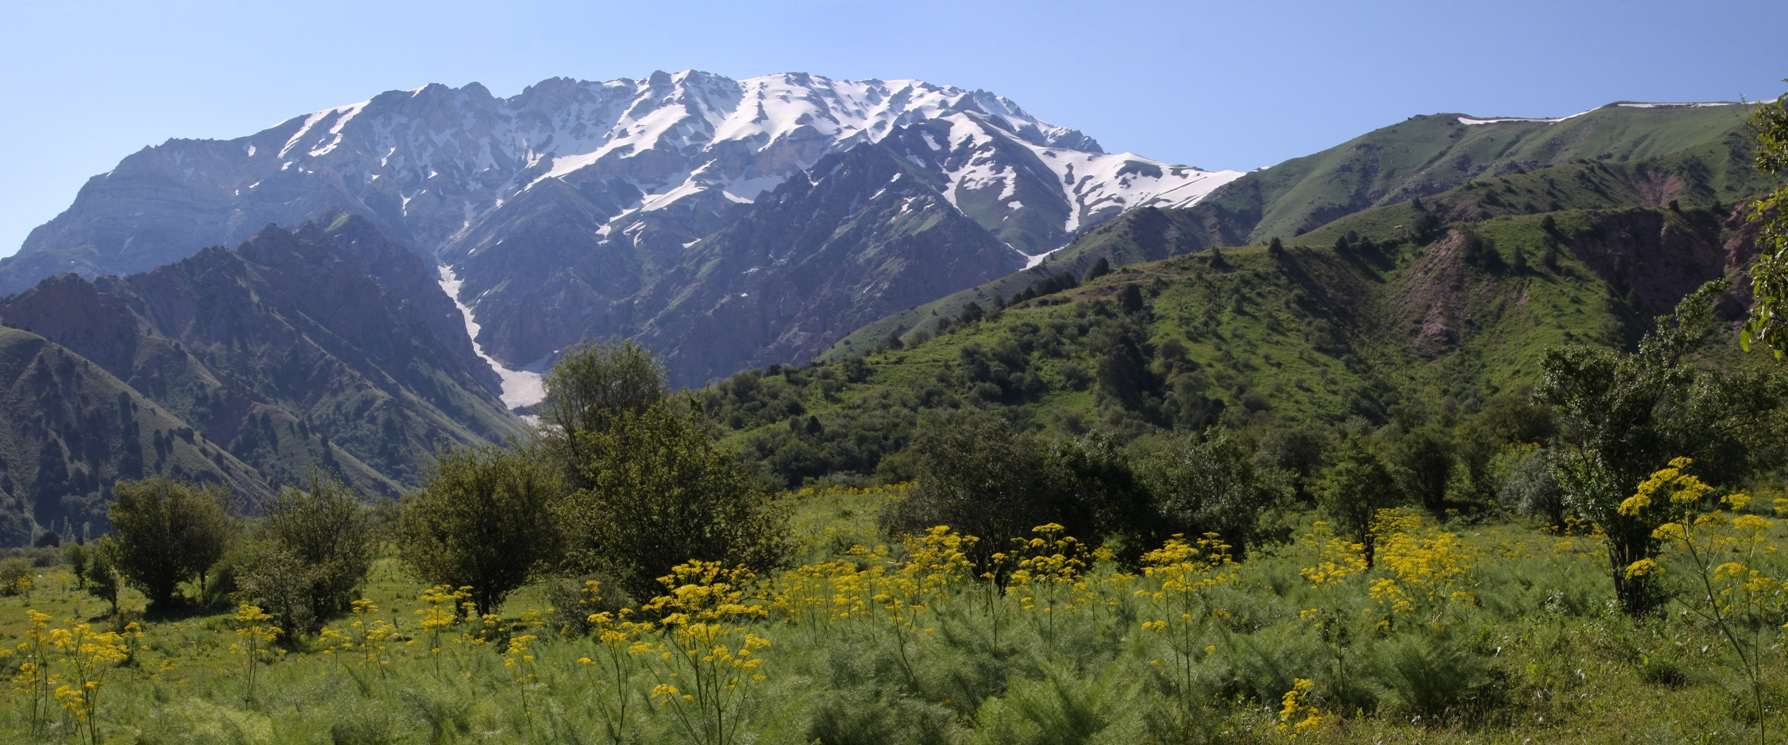 uzbekistan_nature-381